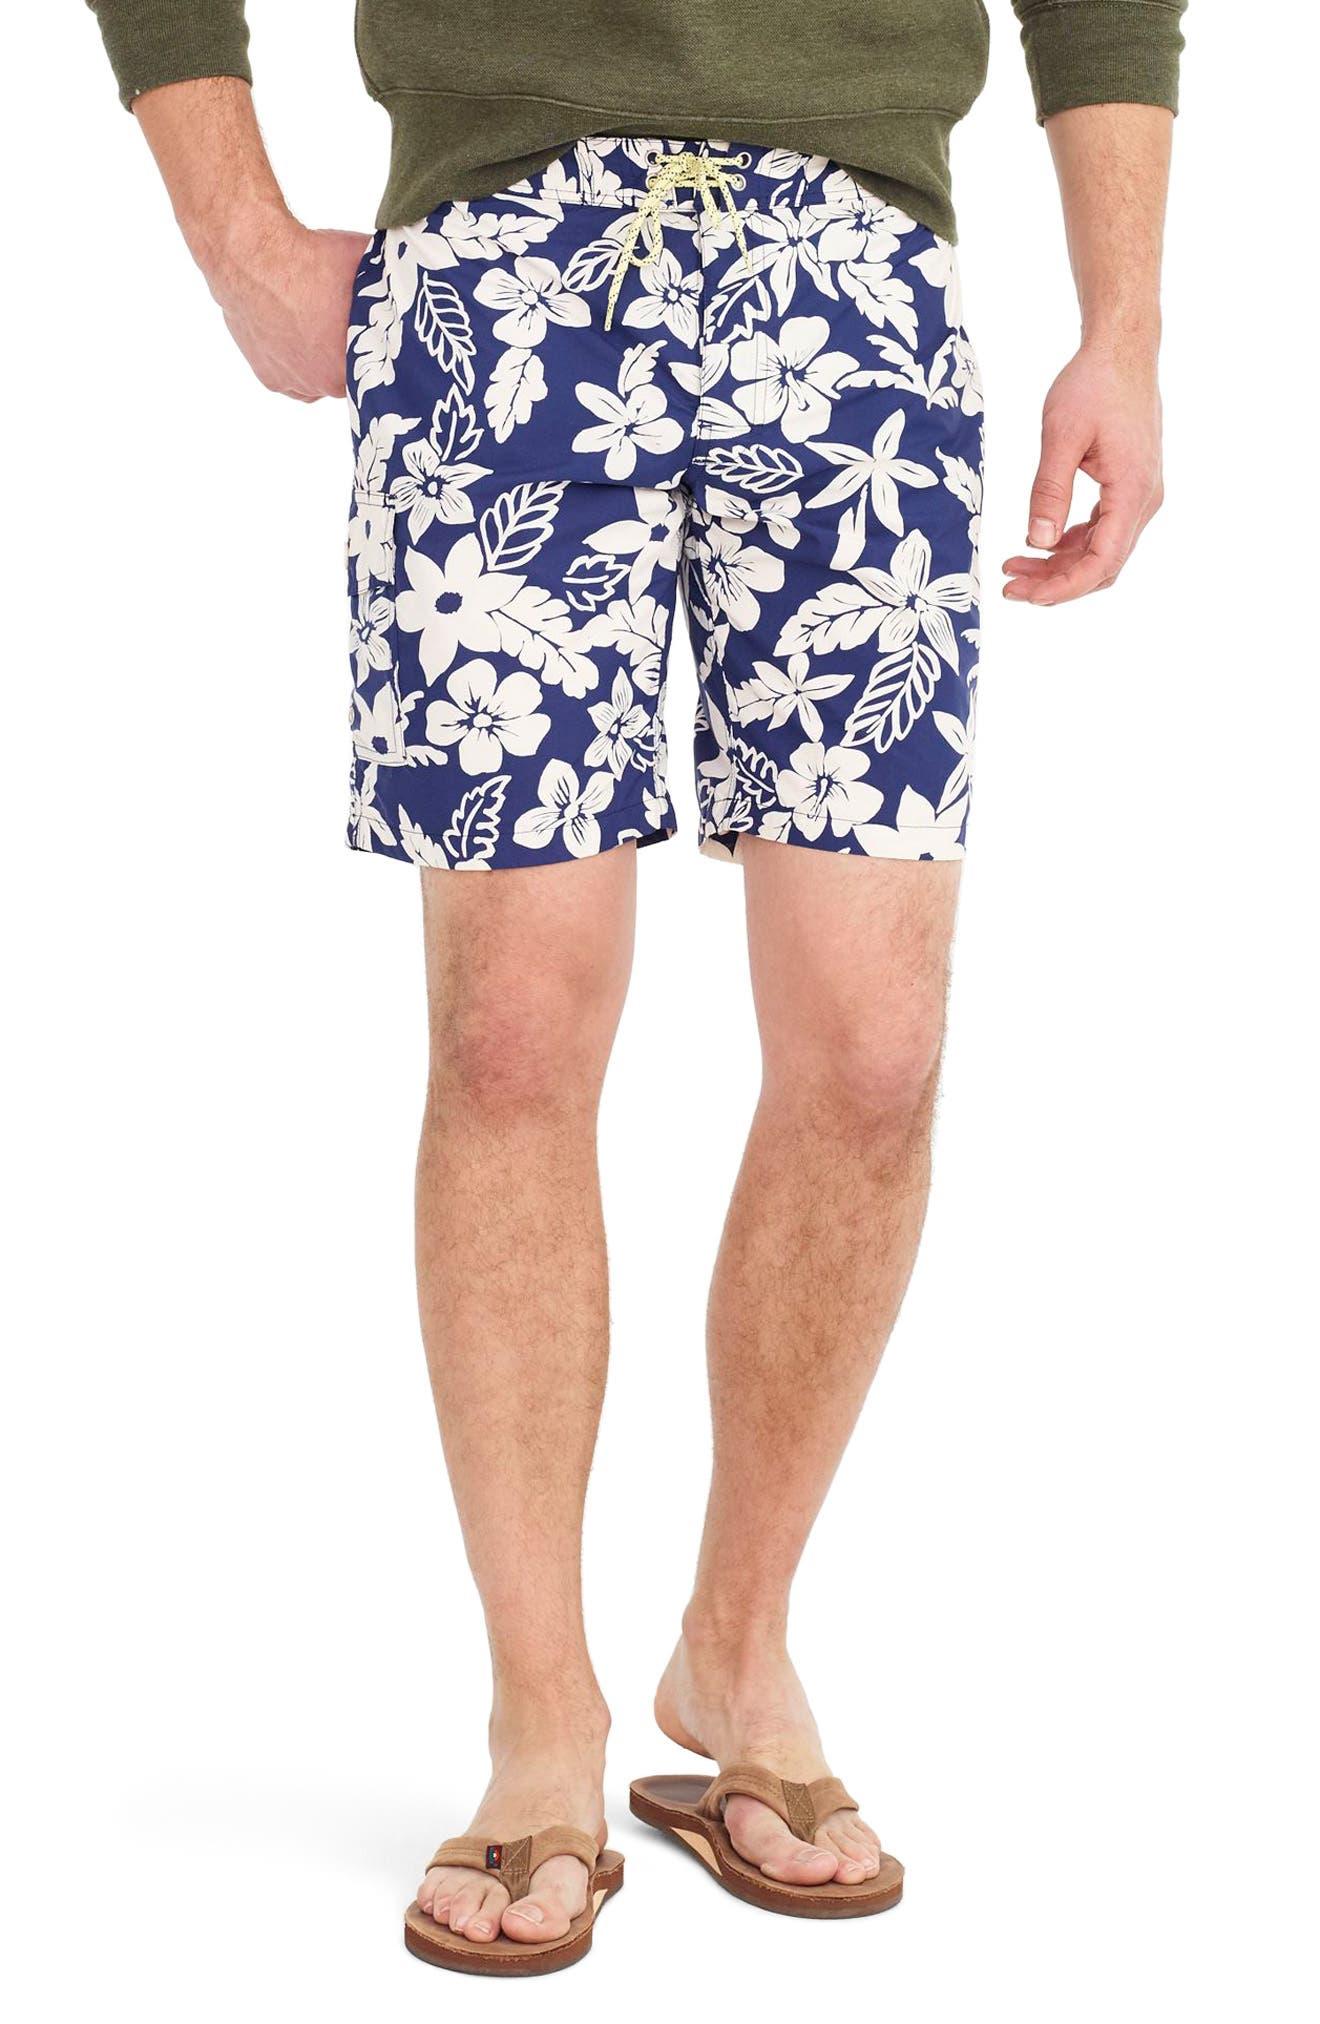 J.Crew Floral Swim Trunks